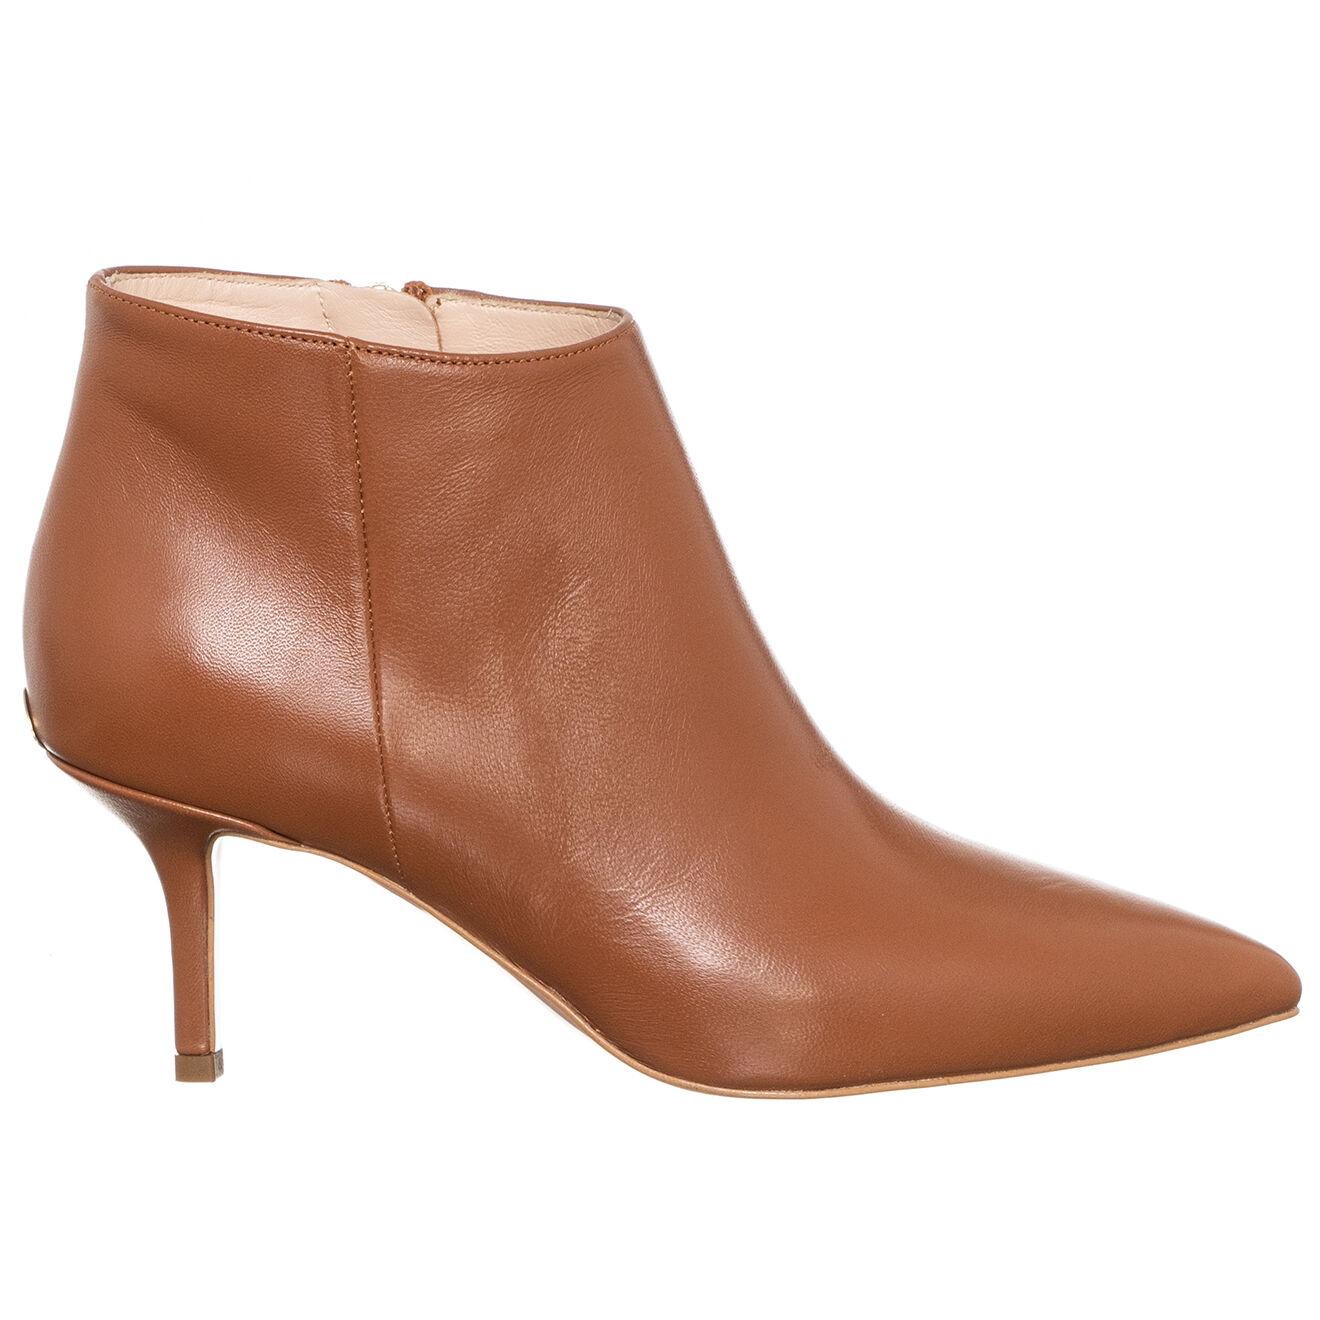 Boots en Cuir Audrey marron - Talon 7 cm - Liu-Jo - Modalova